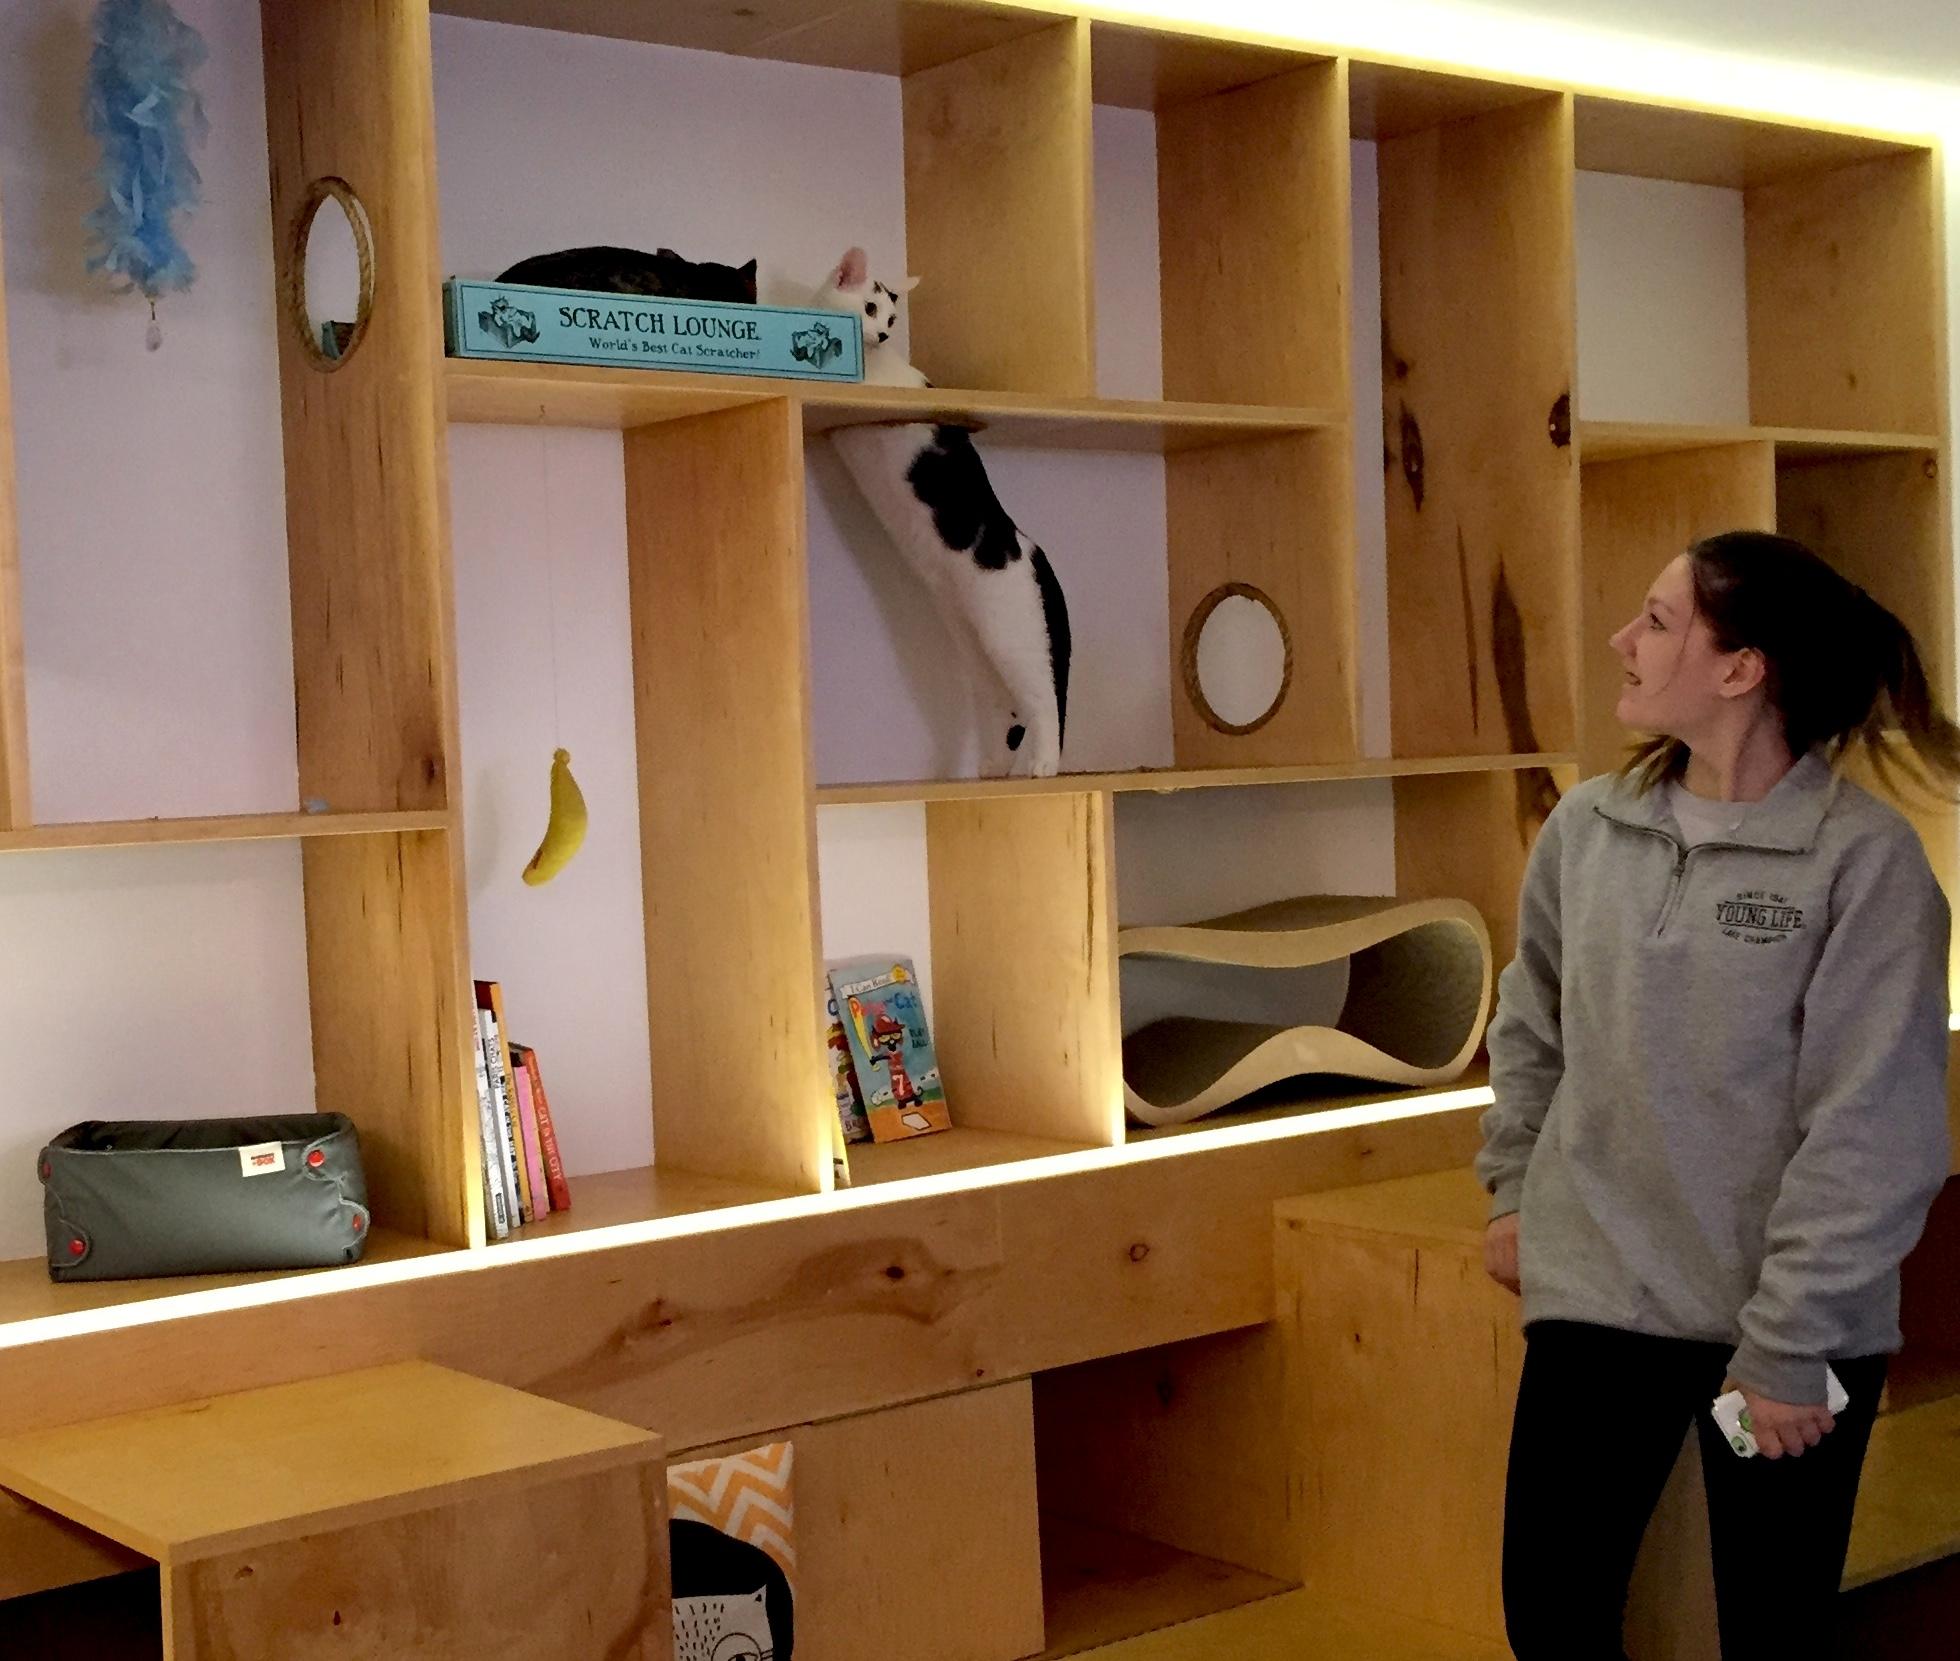 Roger-in-shelf